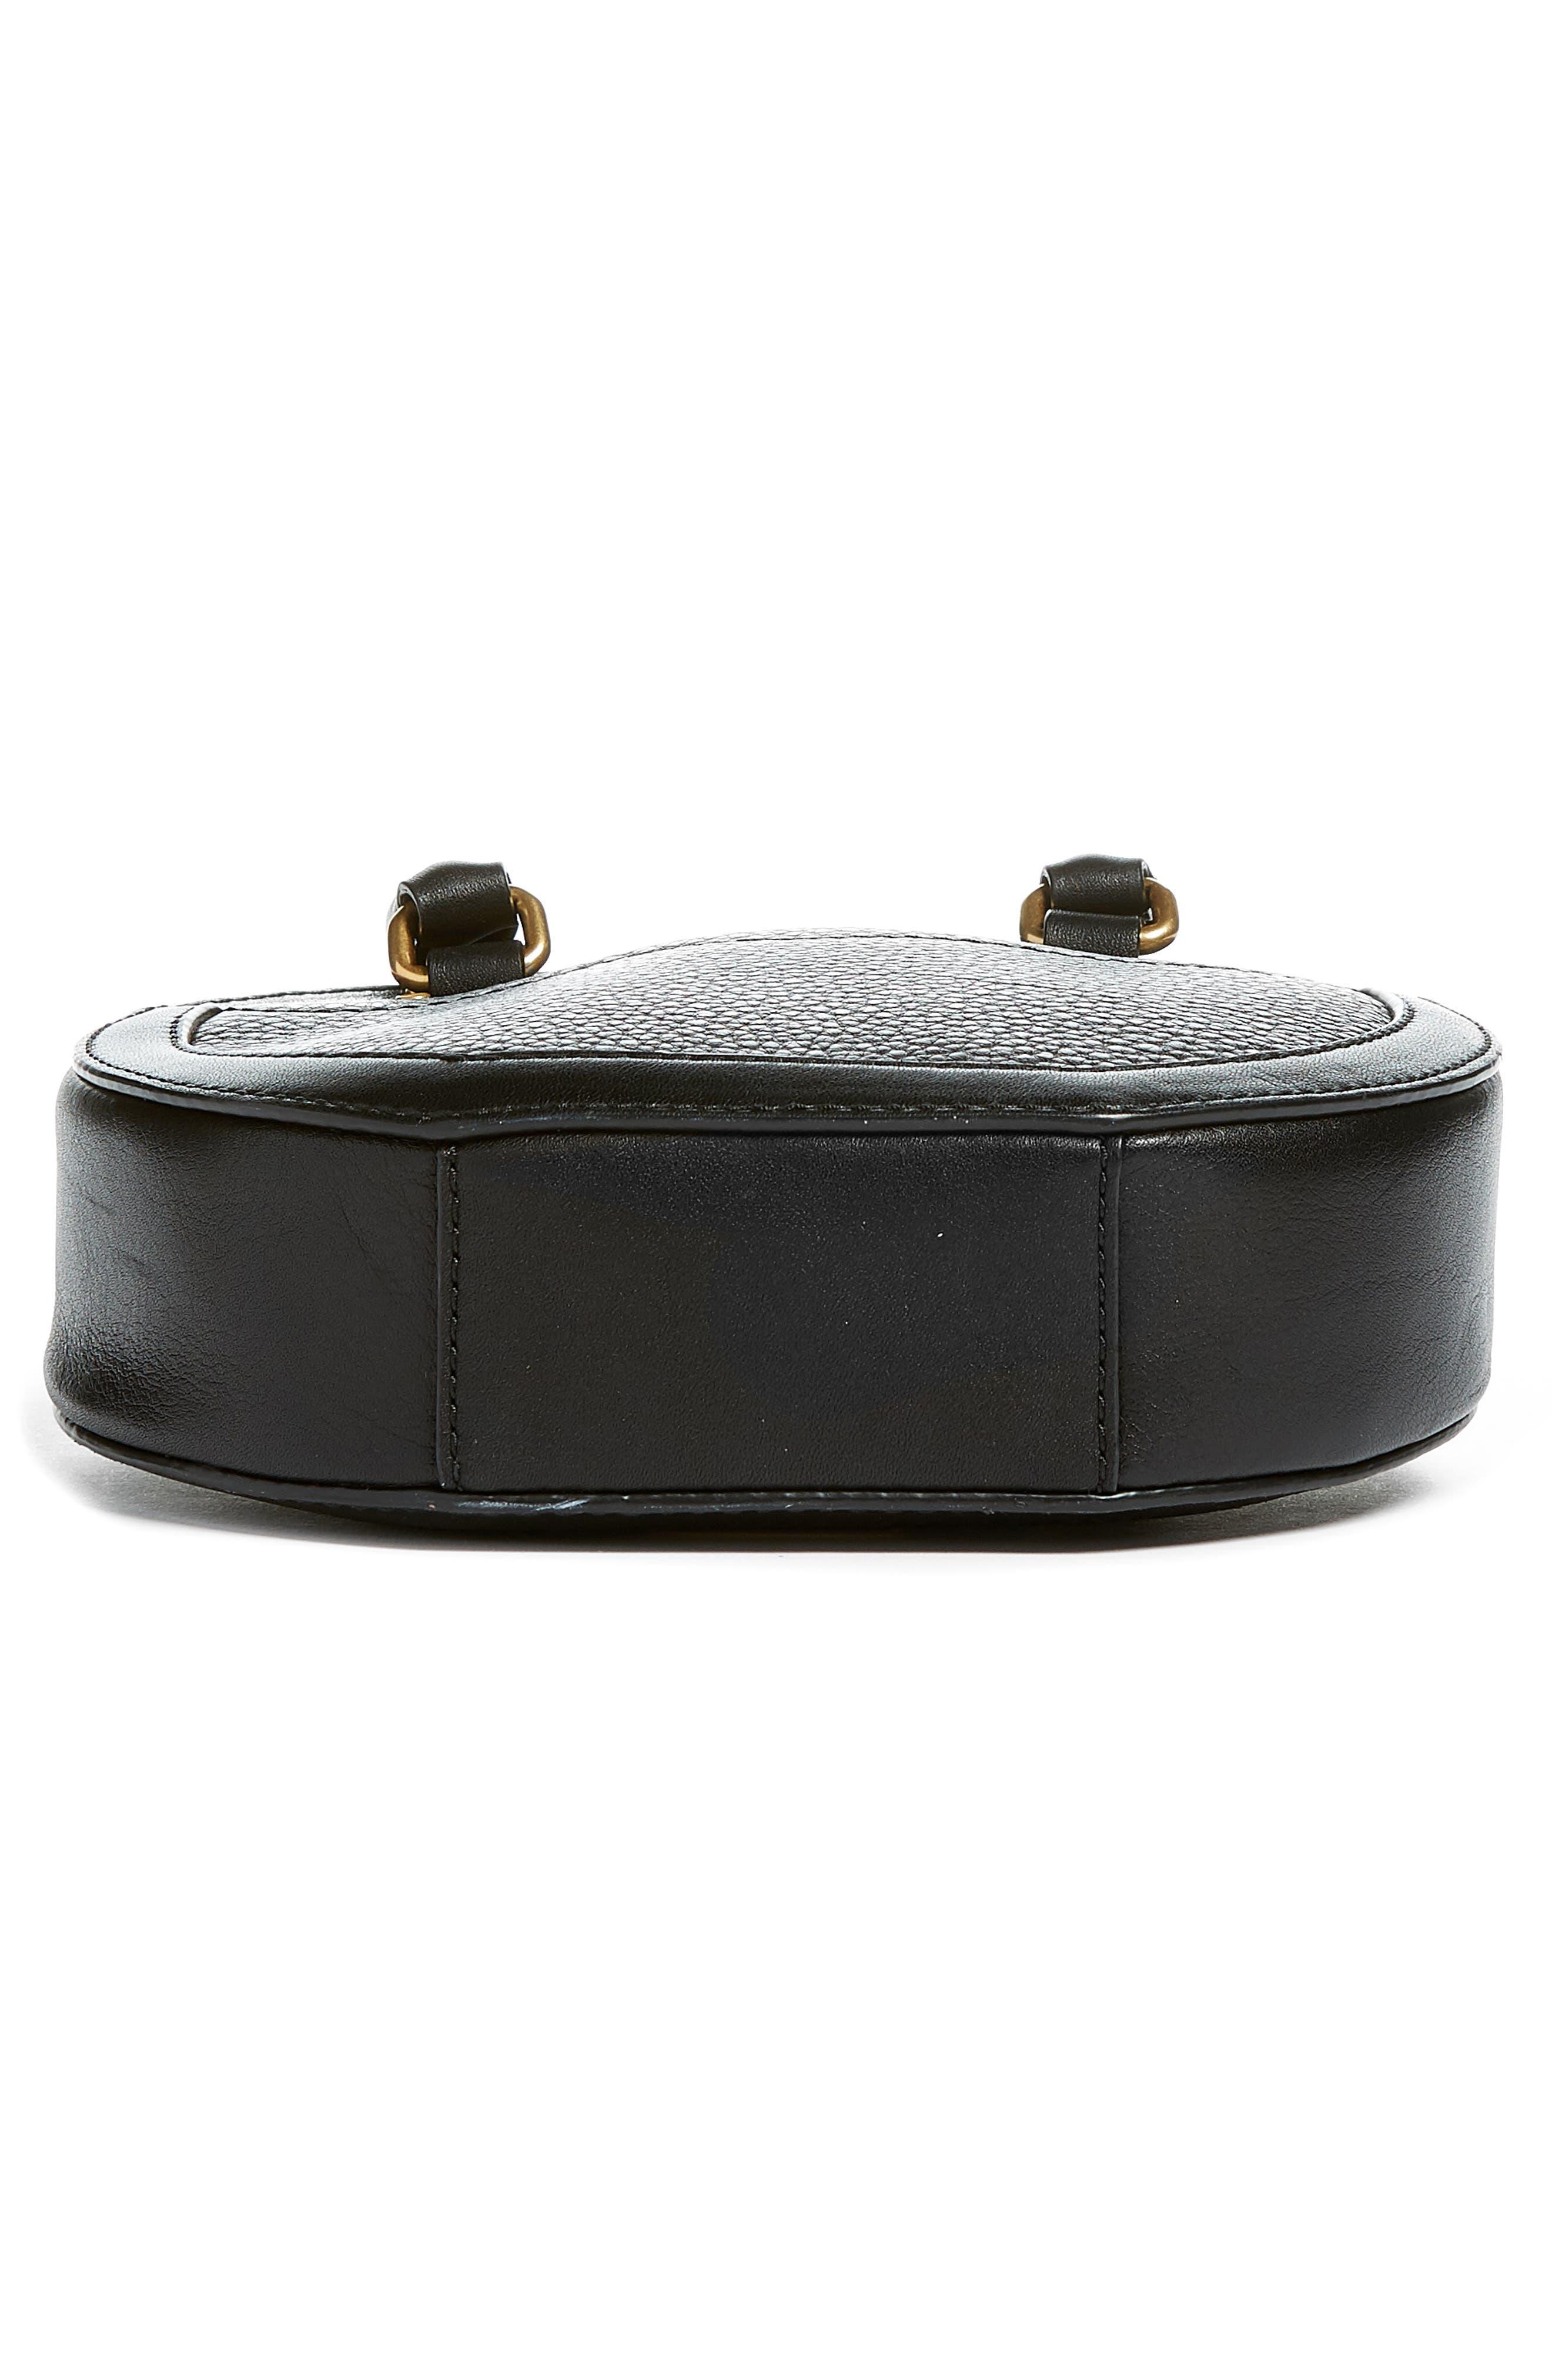 Bree Circle Leather Crossbody Bag,                             Alternate thumbnail 6, color,                             Black